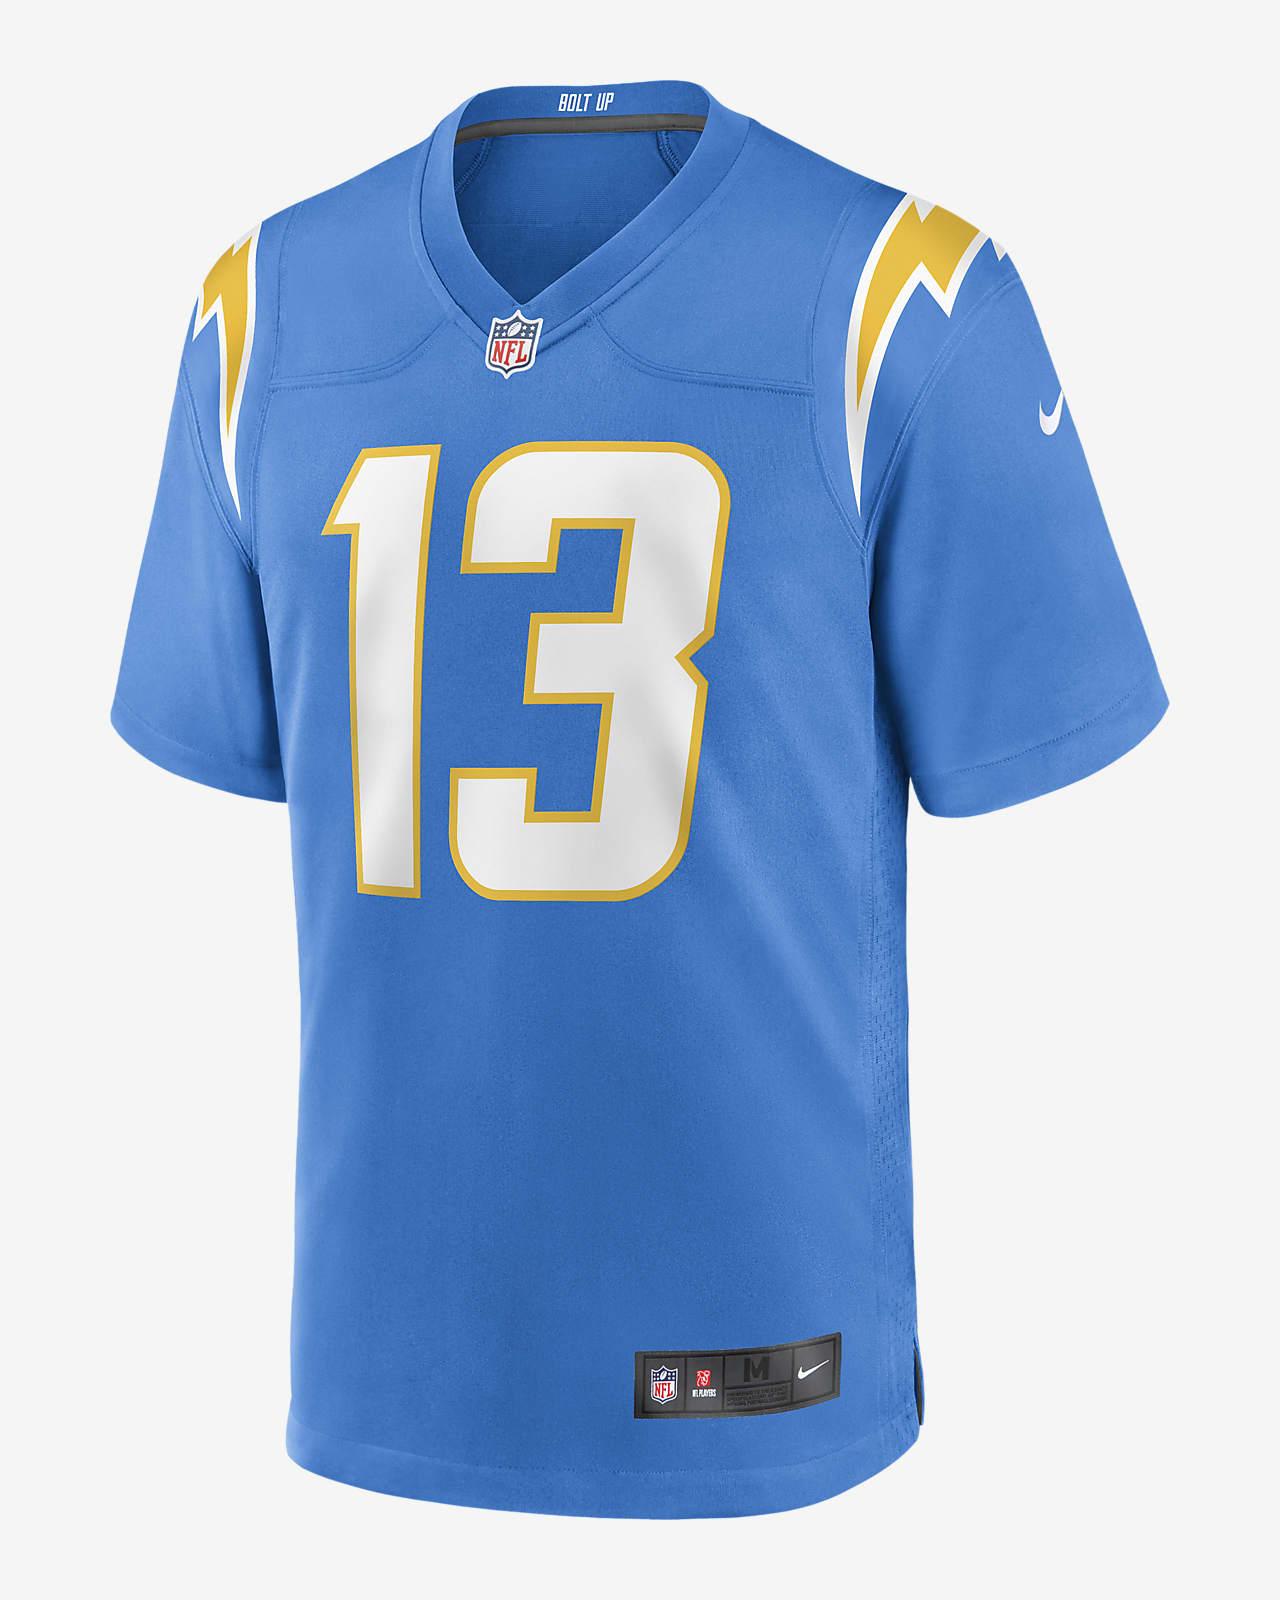 NFL Los Angeles Chargers (Keenan Allen) Men's Game American Football Jersey